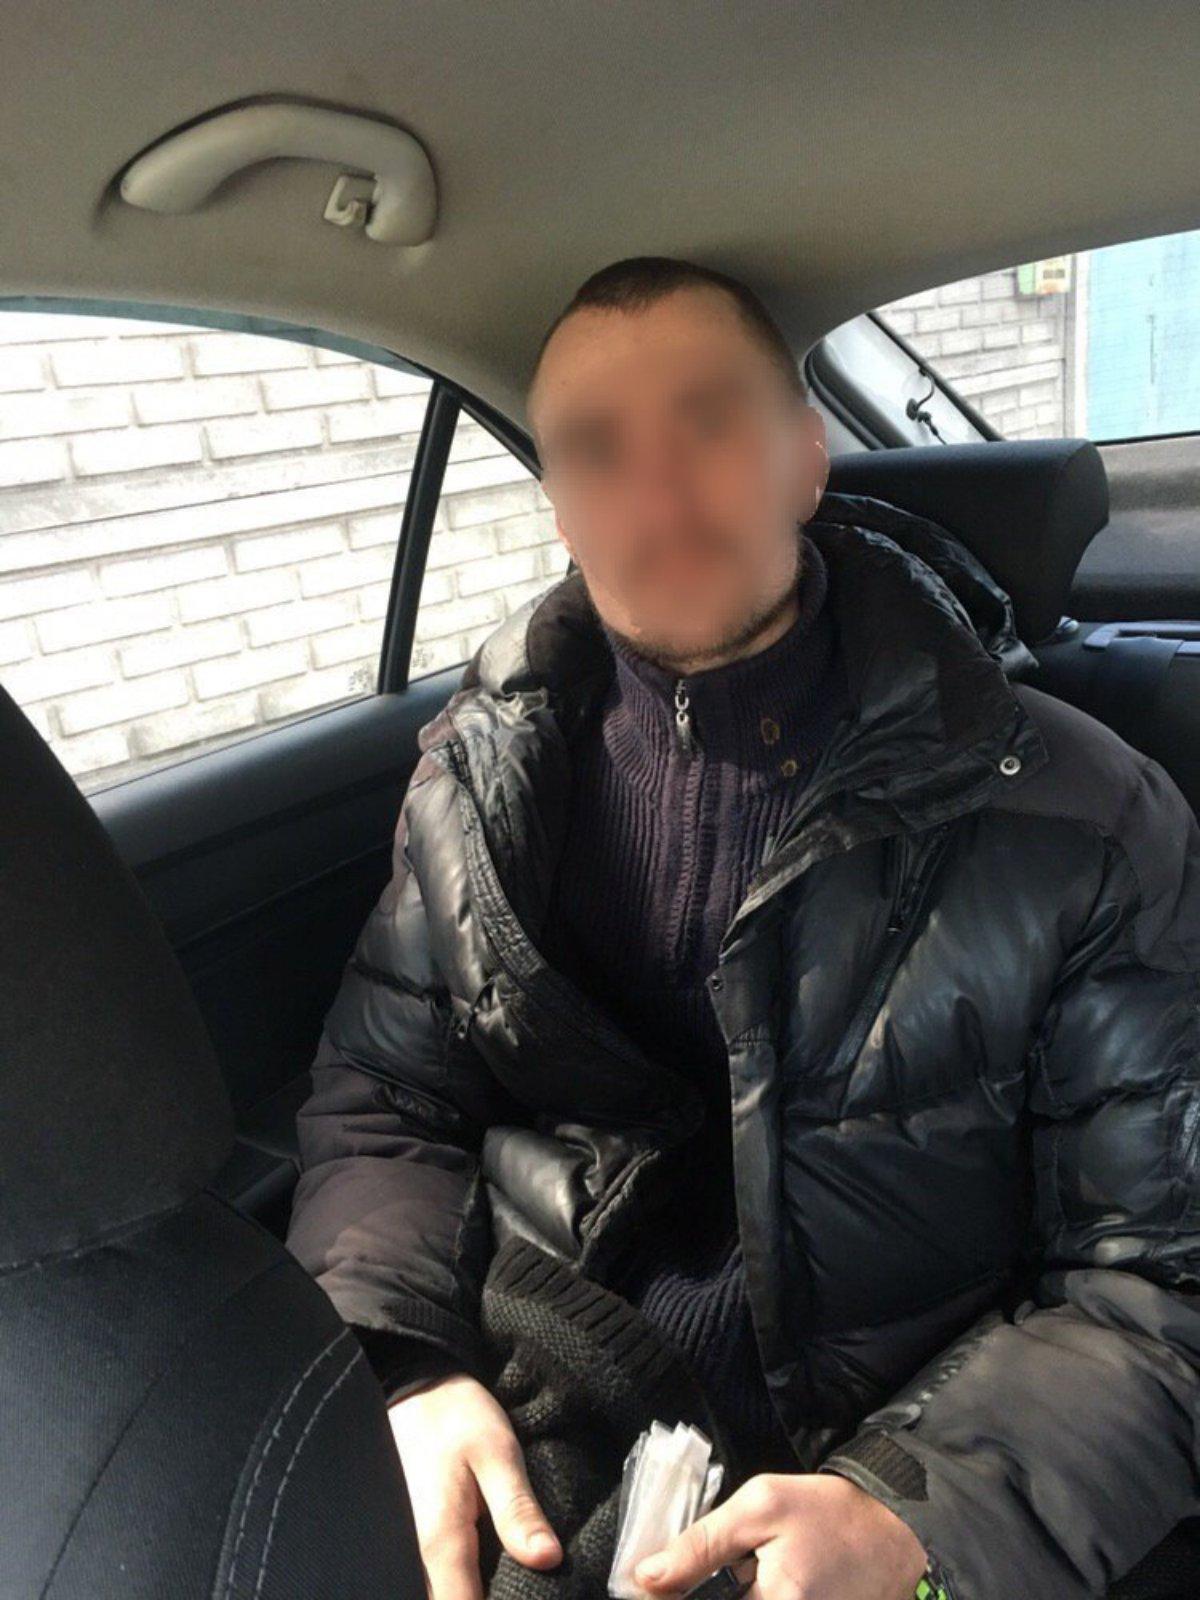 У Броварах виявлено чергового любителя метадону -  - yzobrazhenye viber 2020 03 24 16 29 30